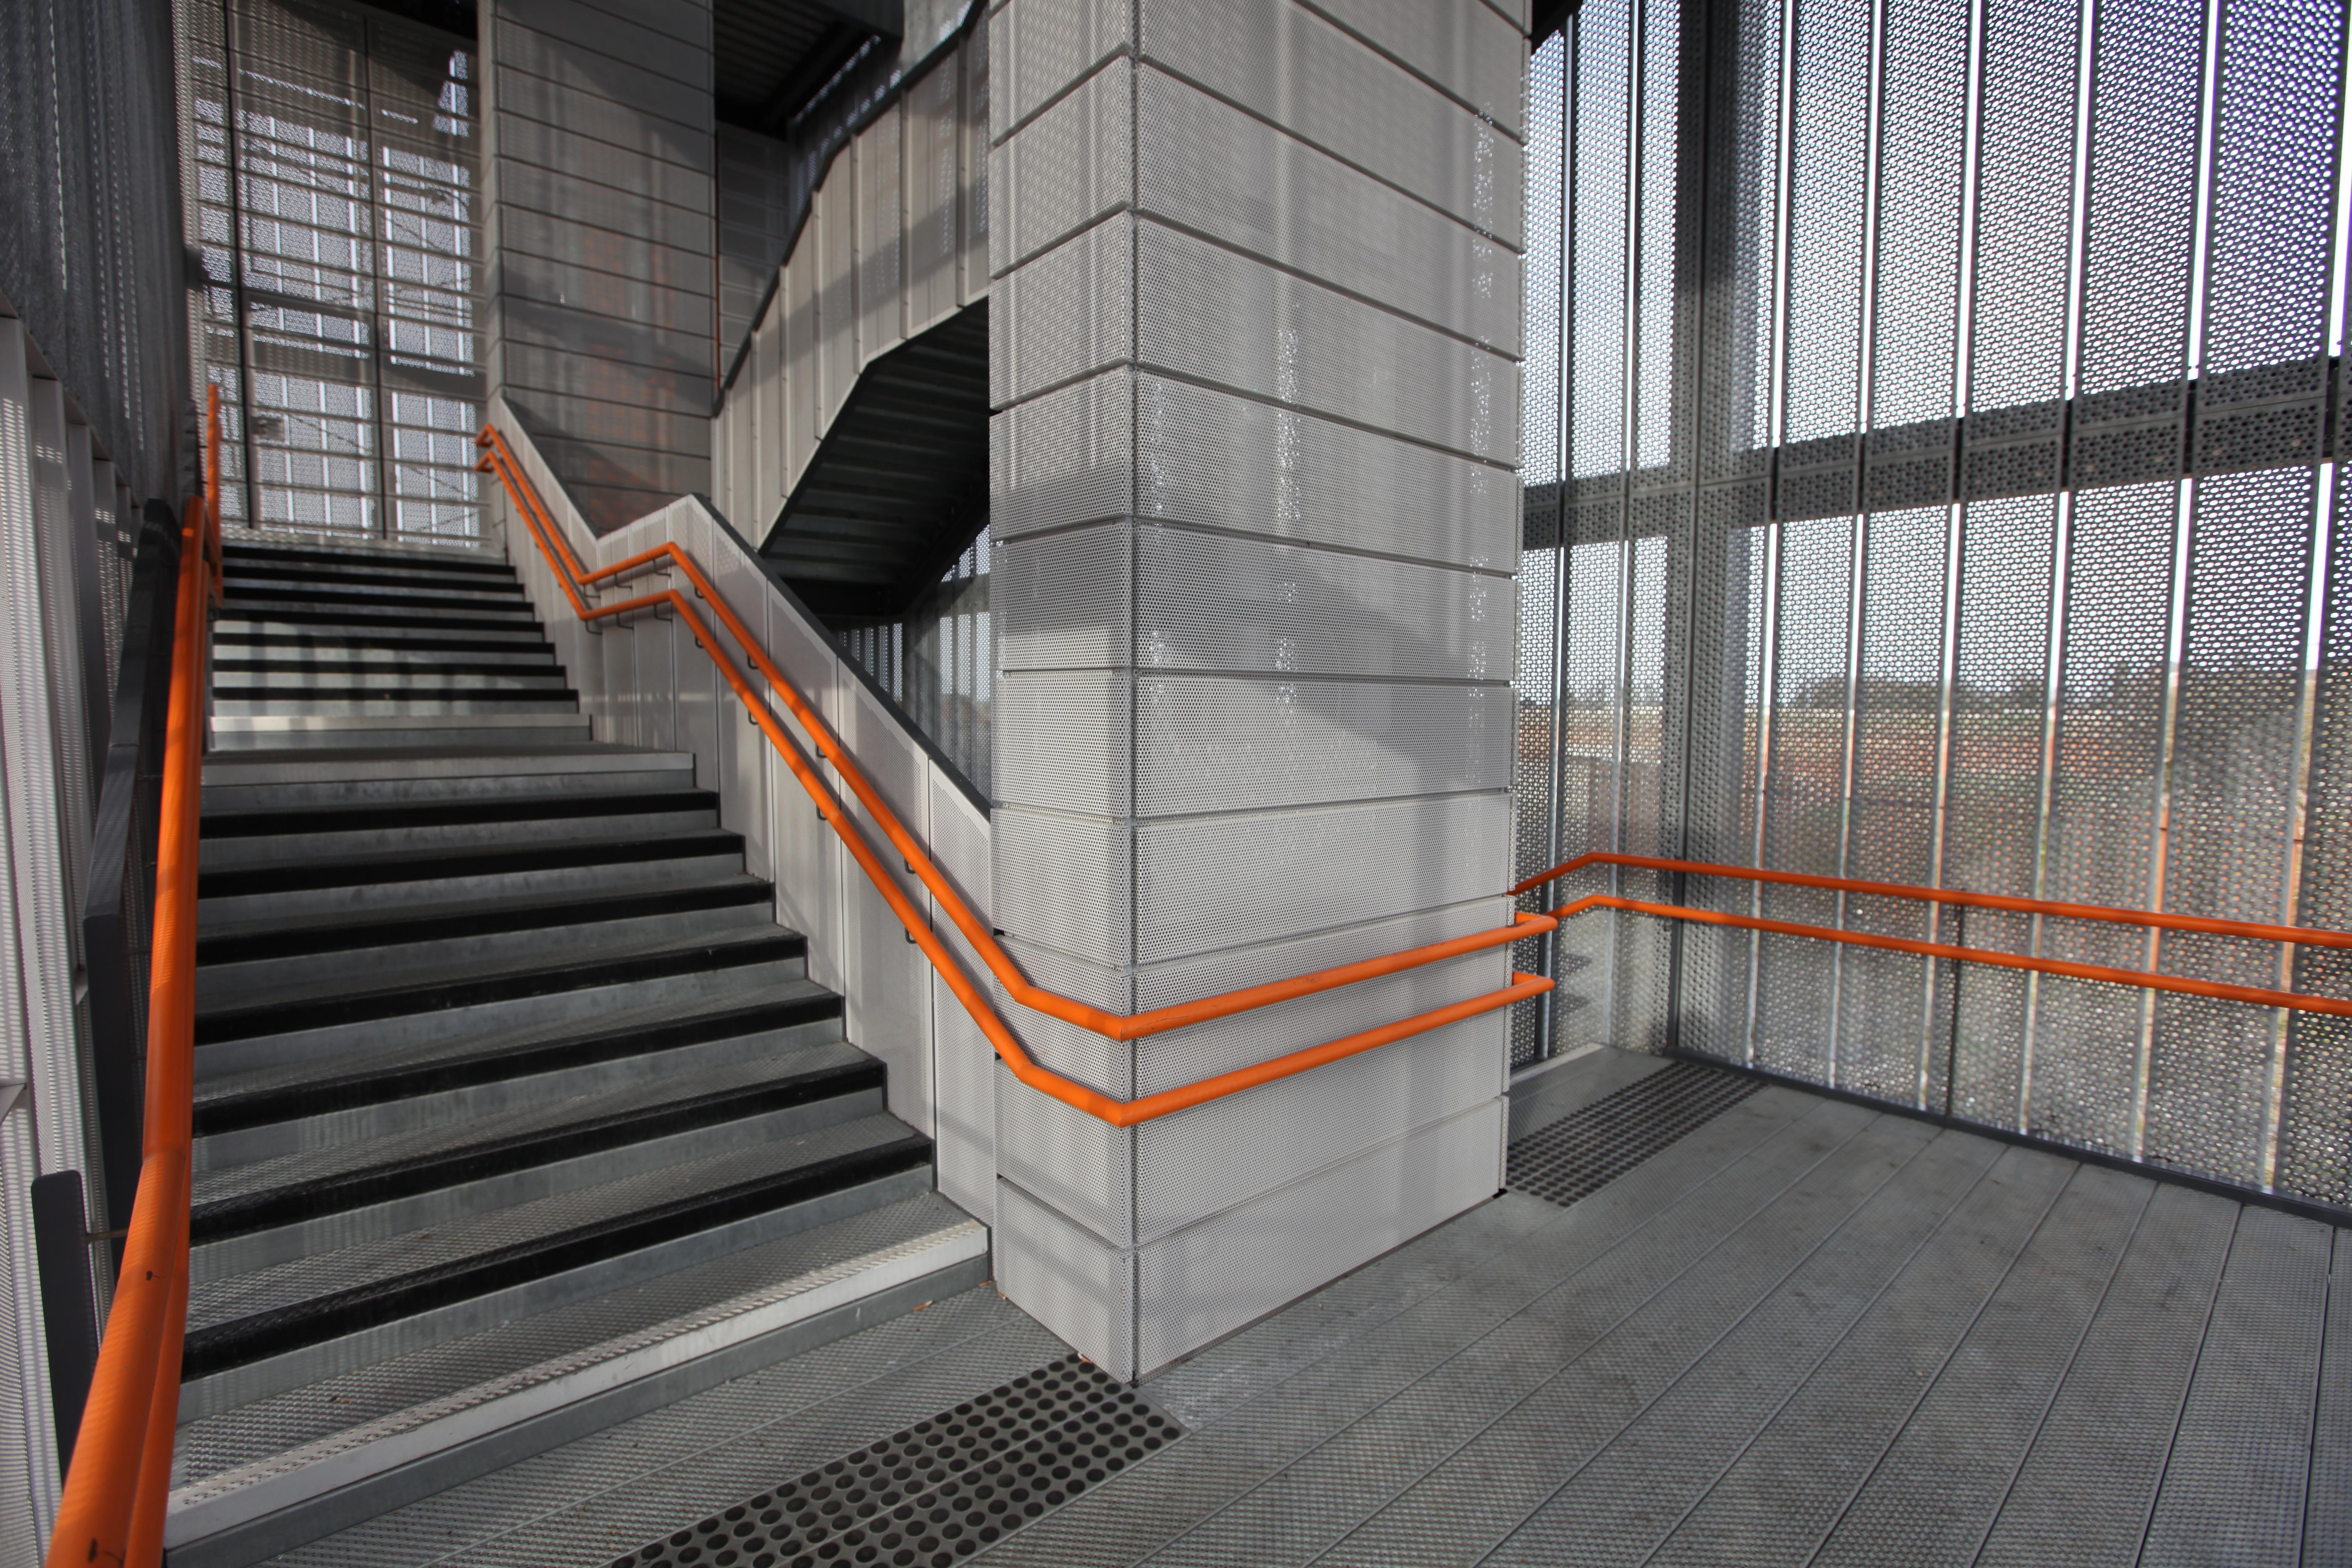 Train Station, Perforated Metal, Safedeck, Bespoke Design, Metal Design